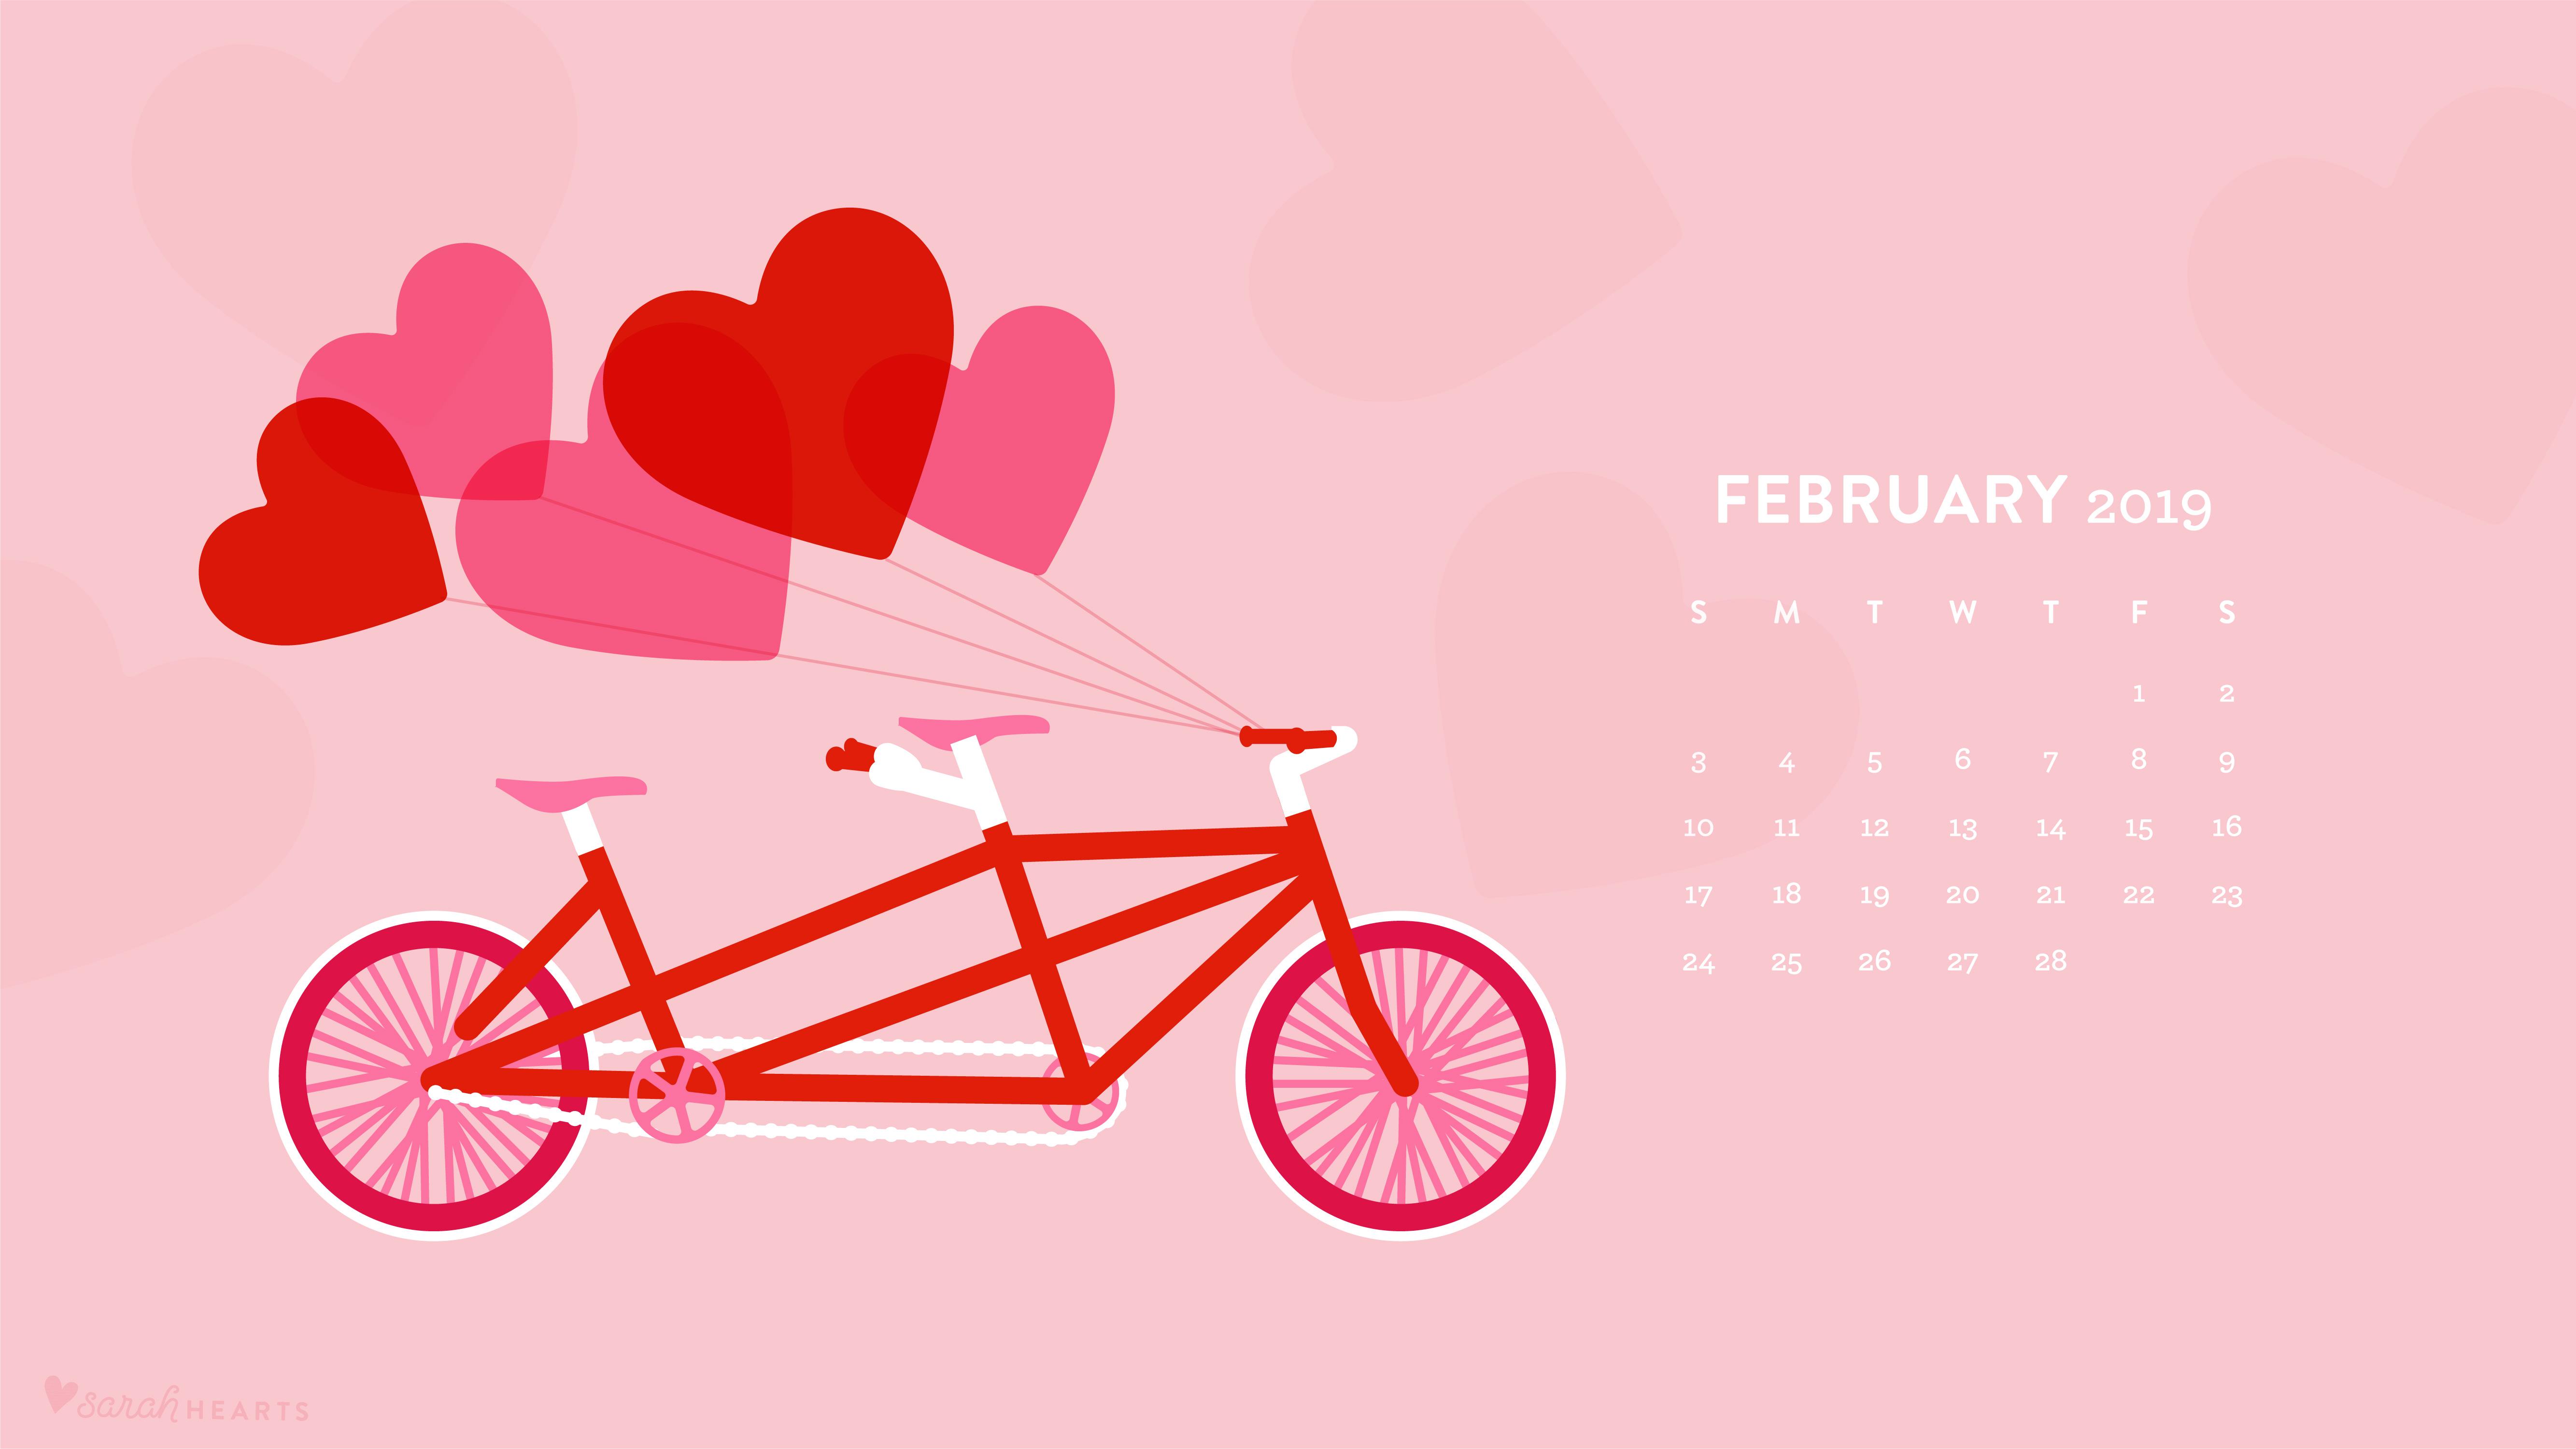 February Calendar M - F 2019 February 2019 Tandem Bike Calendar Wallpaper   Sarah Hearts